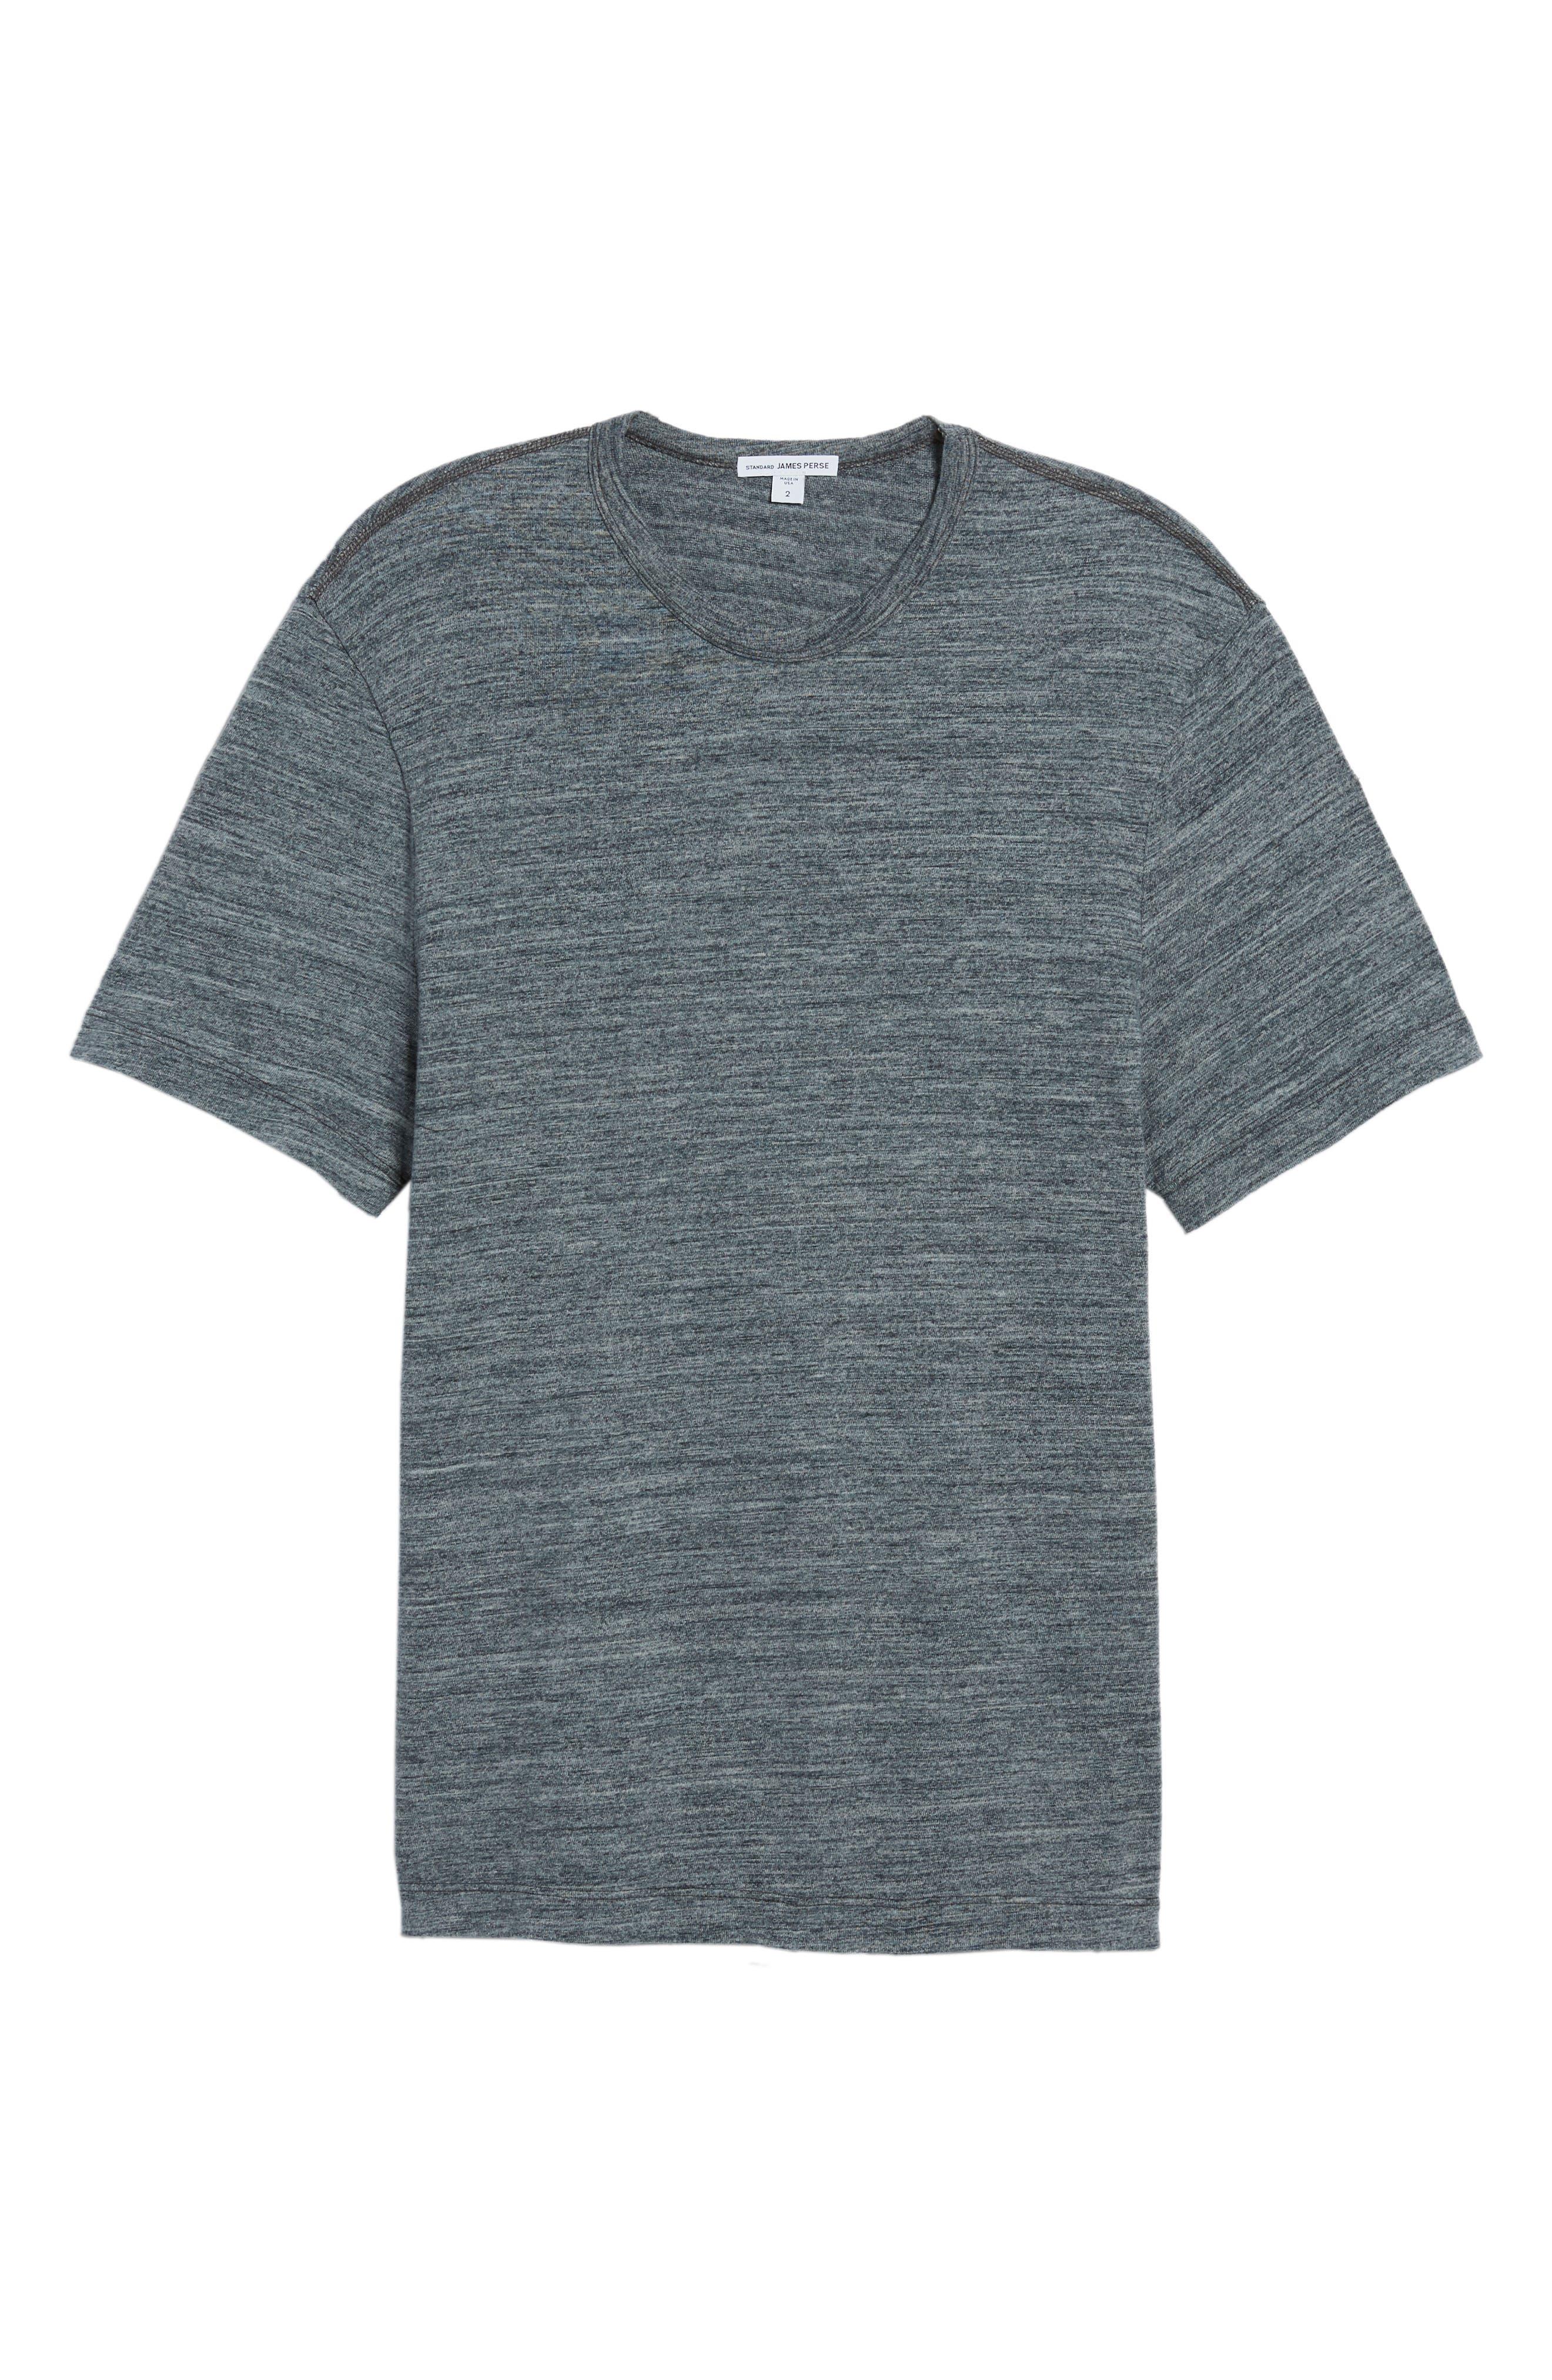 Regular Fit Top Dyed Crewneck T-Shirt,                             Alternate thumbnail 16, color,